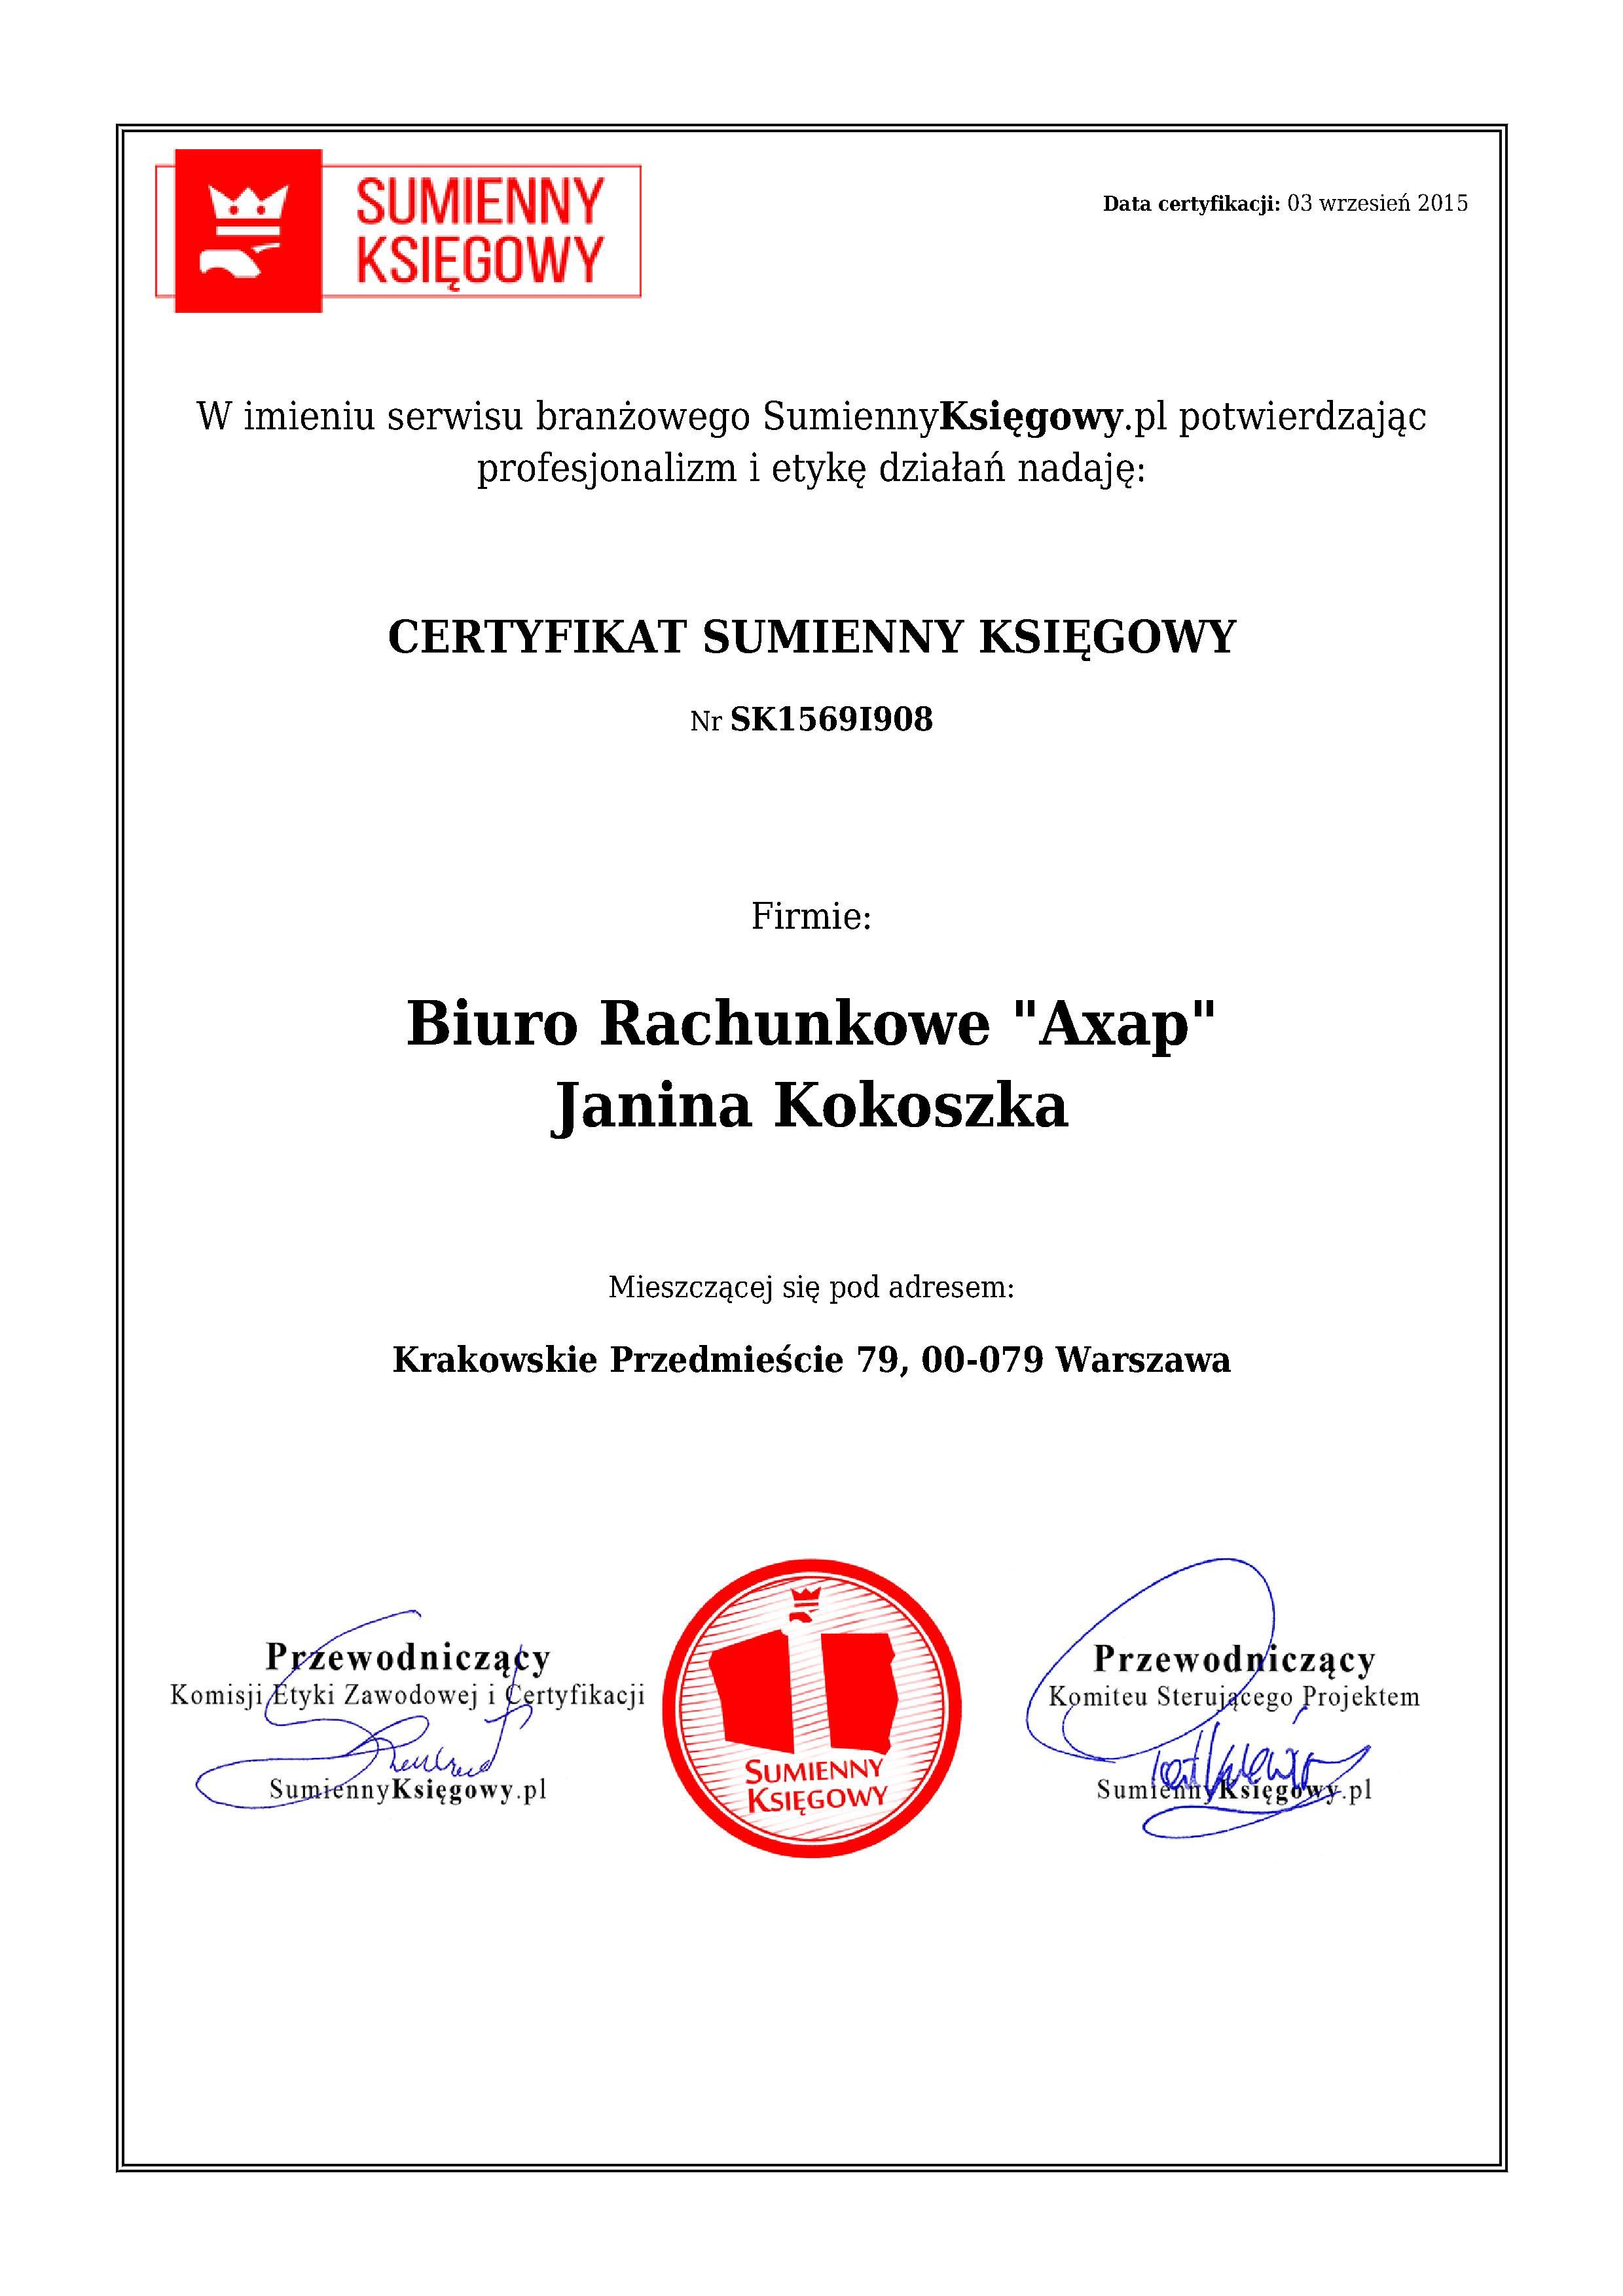 Certyfikat Biuro Rachunkowe